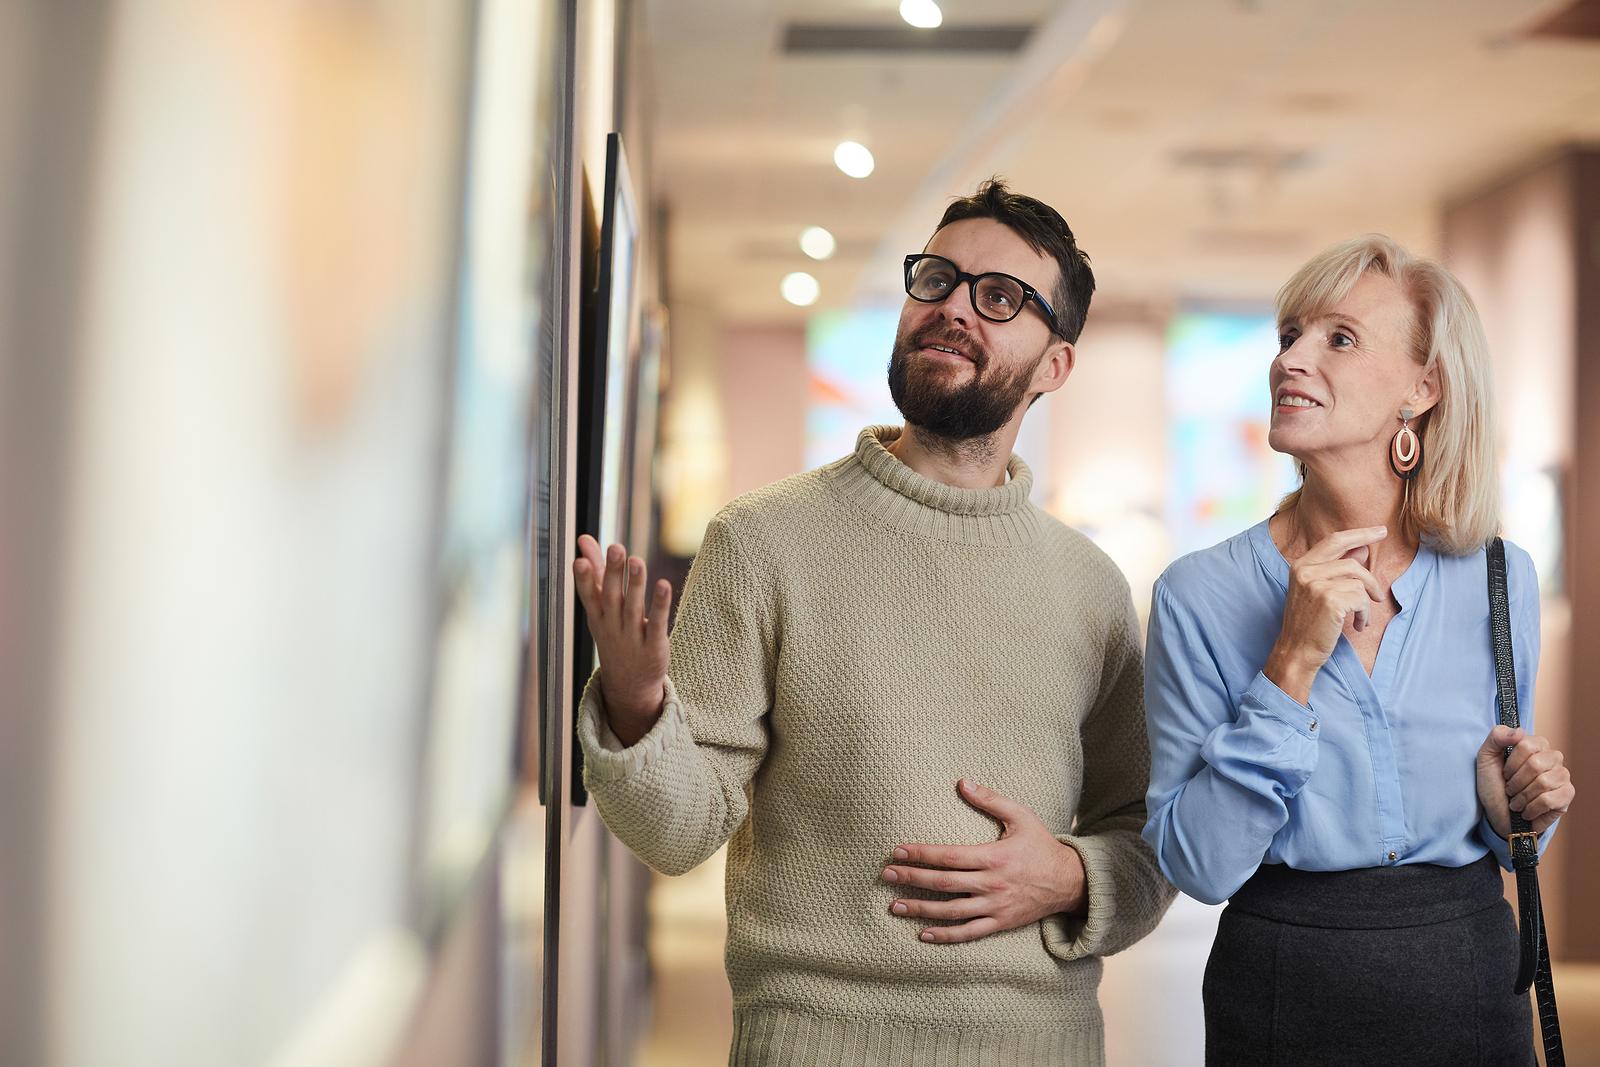 Main Benefits of Working with Top Art Advisors